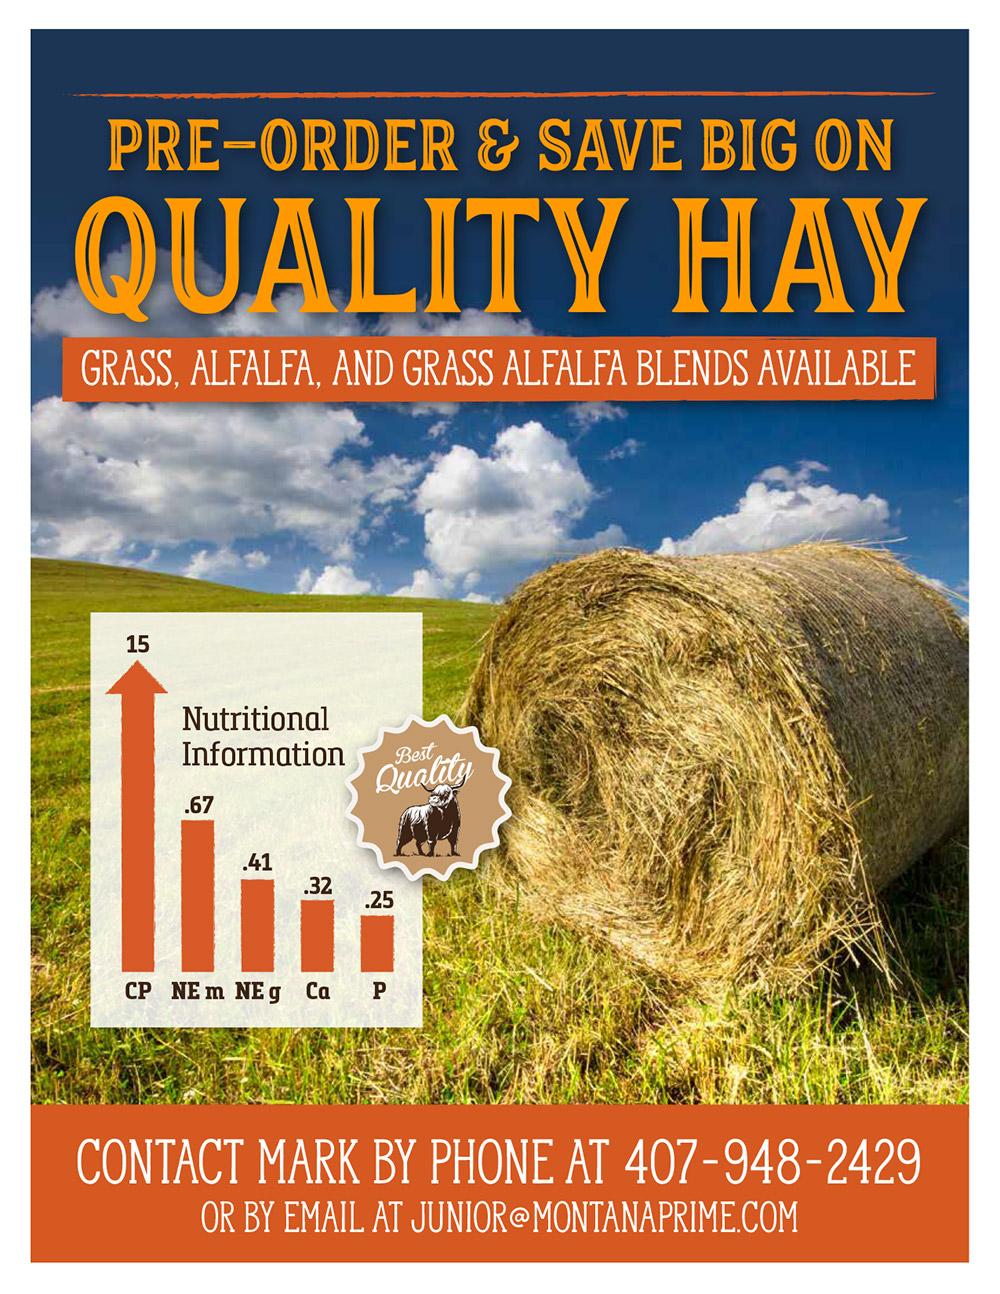 Hay at Montana Prime, Grass, Alfalfa, Blend